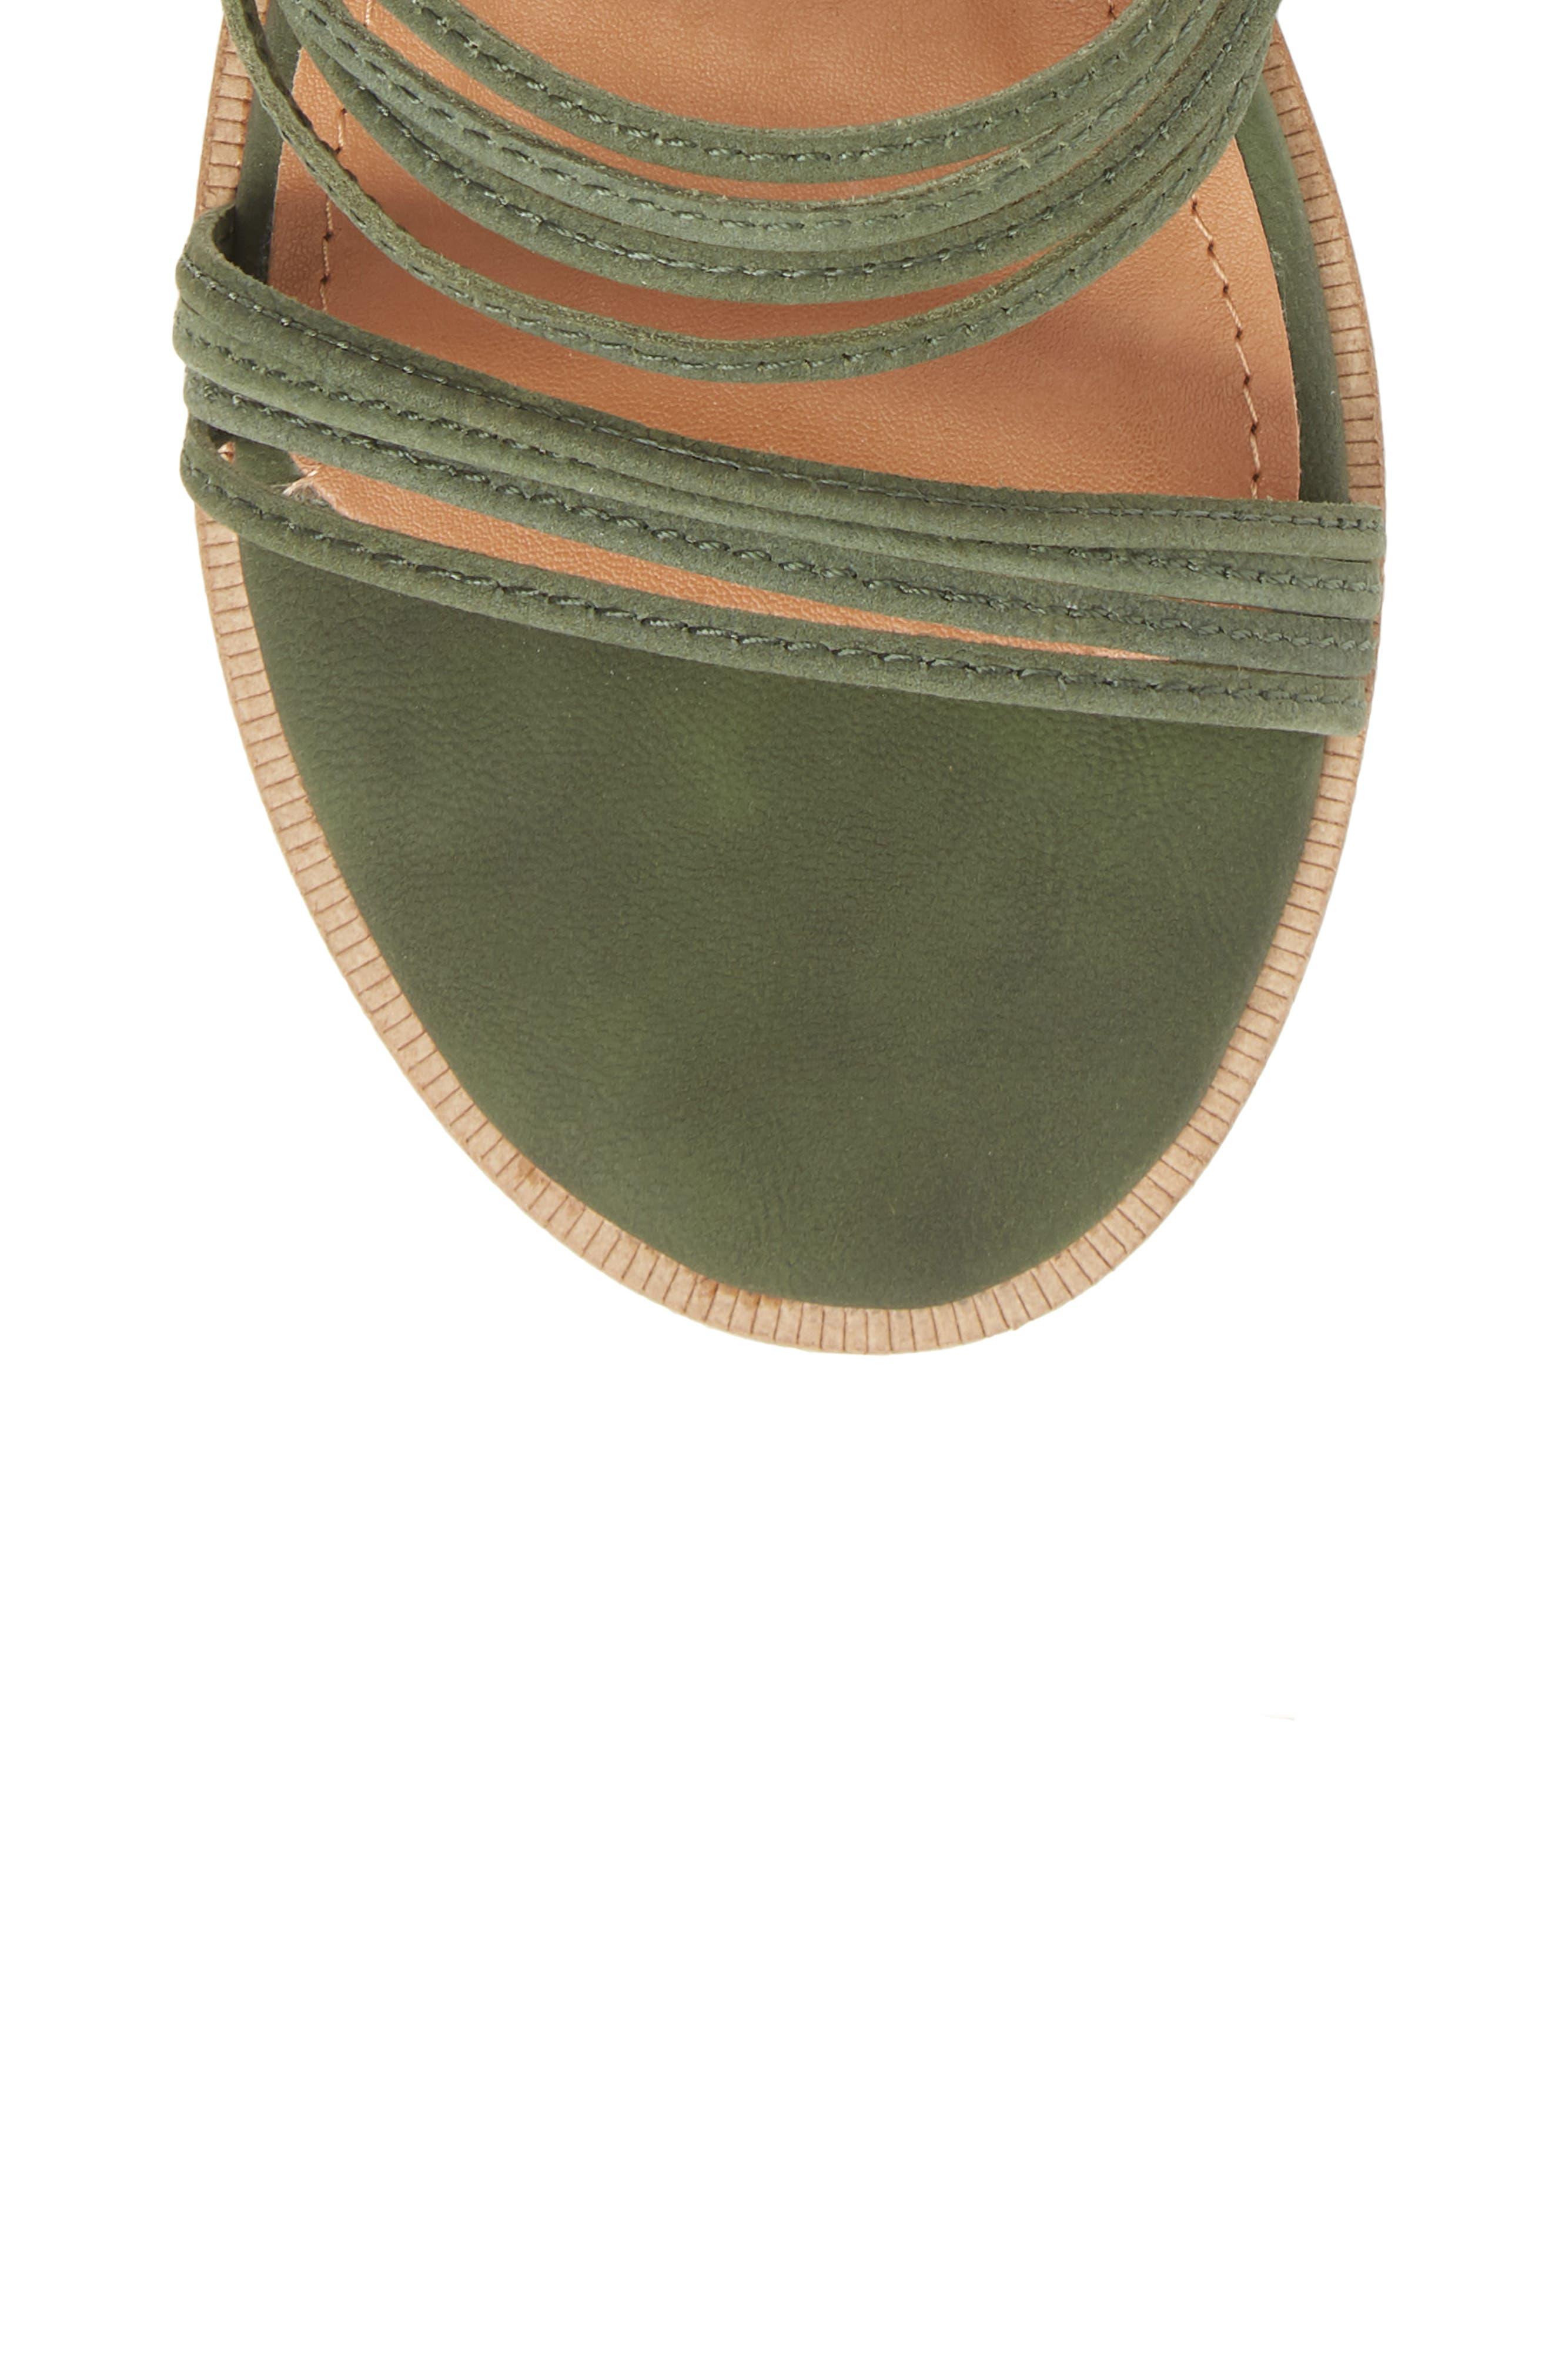 Theory Strappy Flat Sandal,                             Alternate thumbnail 5, color,                             Khaki Leather